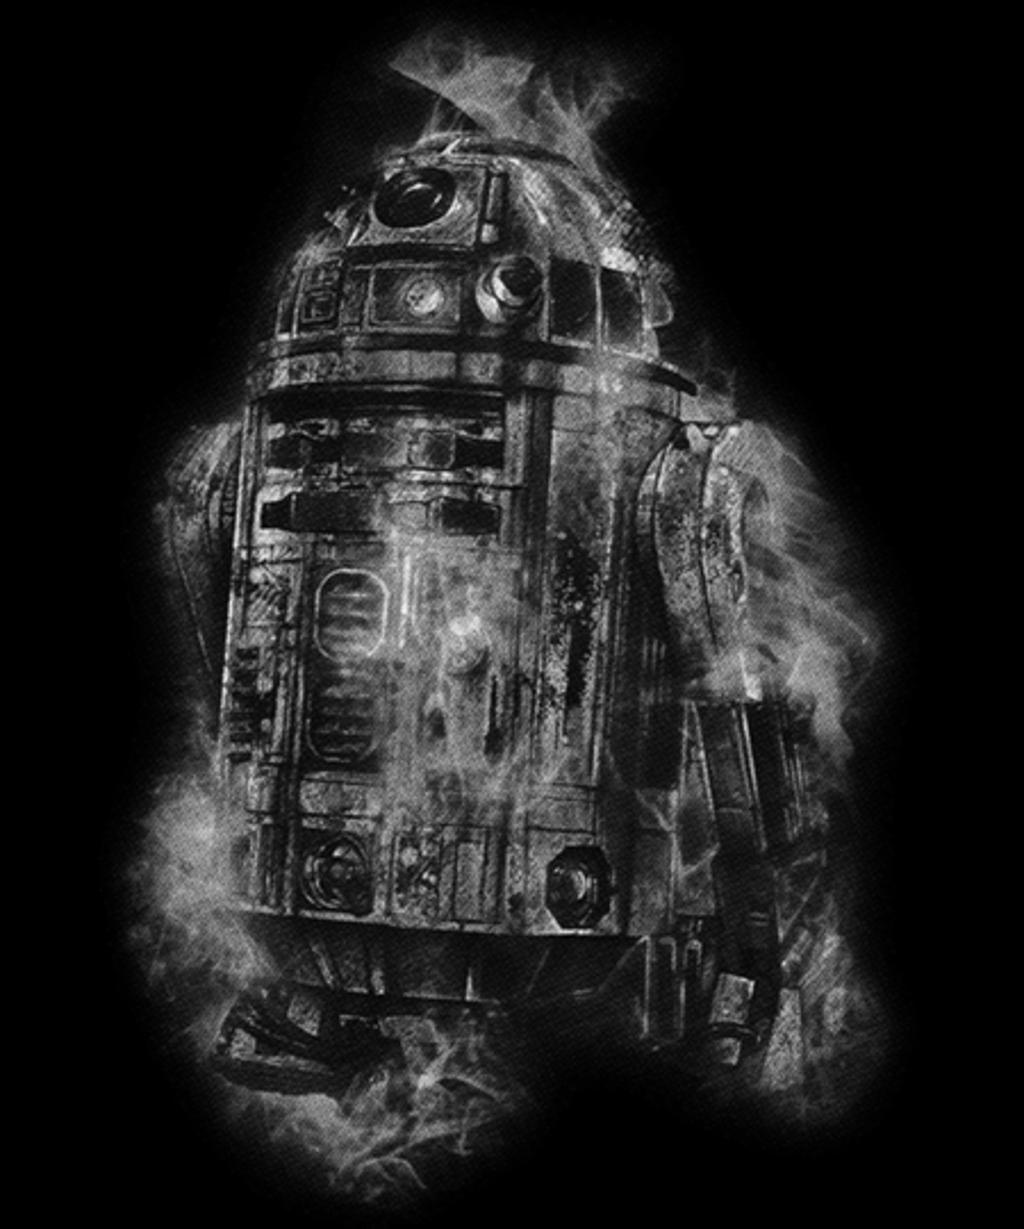 Qwertee: Smoky droid